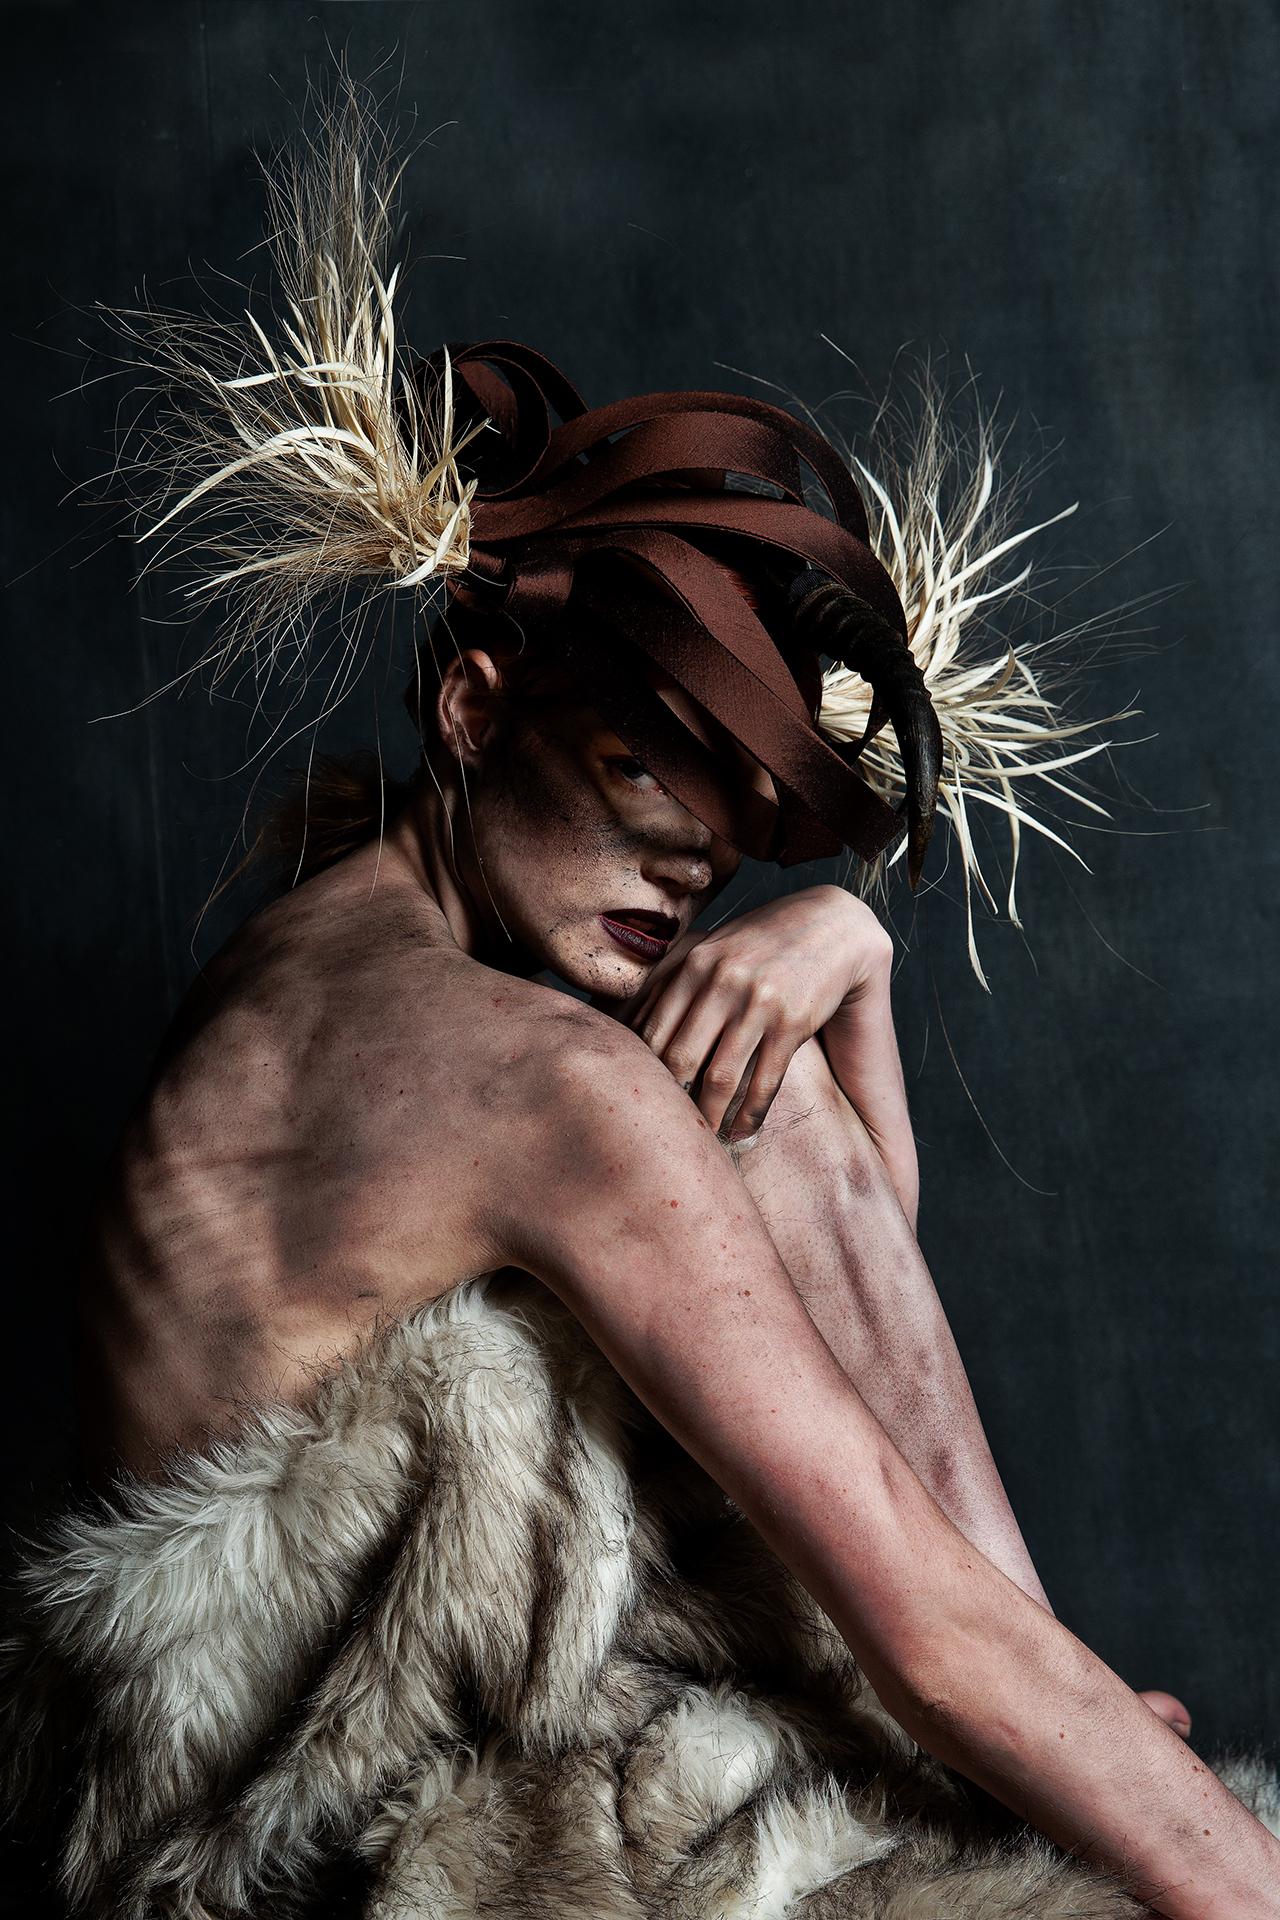 mark_and_naomi_toronto_fashion_photography_david_dunkley_dirty_horn_i.jpg